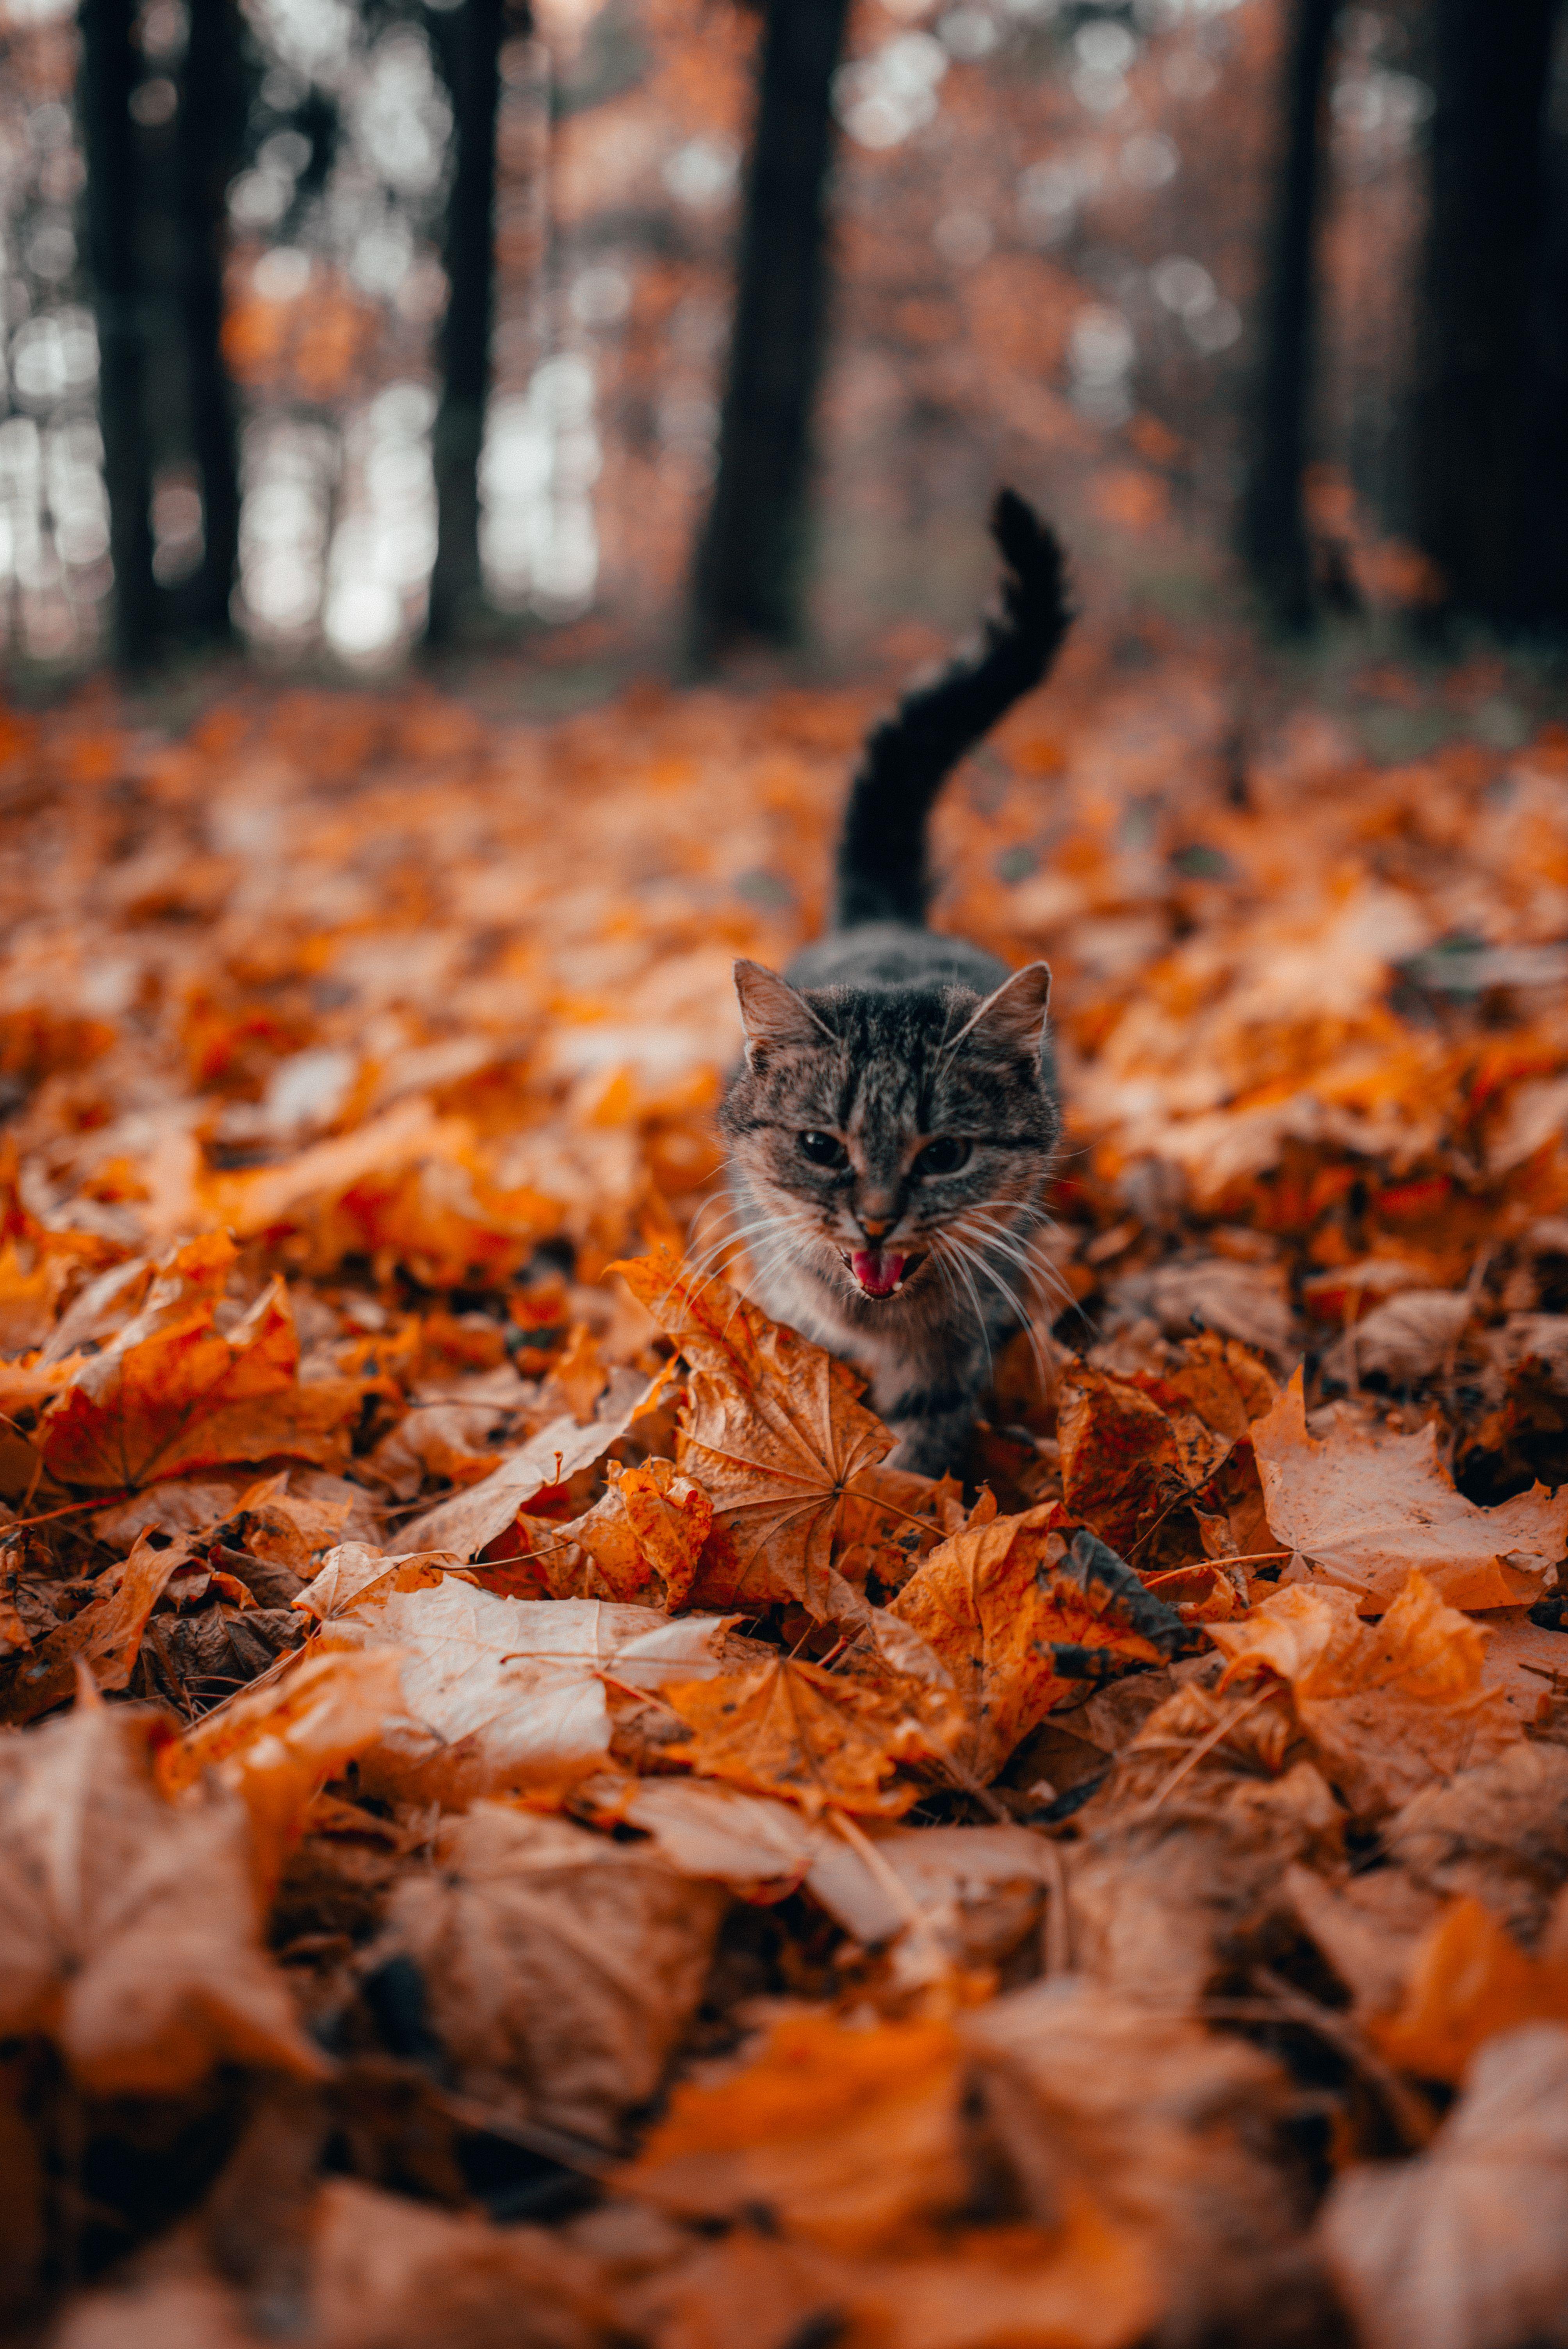 9 Formidable Kitten Appearance Gray Cat Walking On Fallen Leaves Plant Leaf Ground In 2020 Cats Cat Wallpaper Kitten Photos